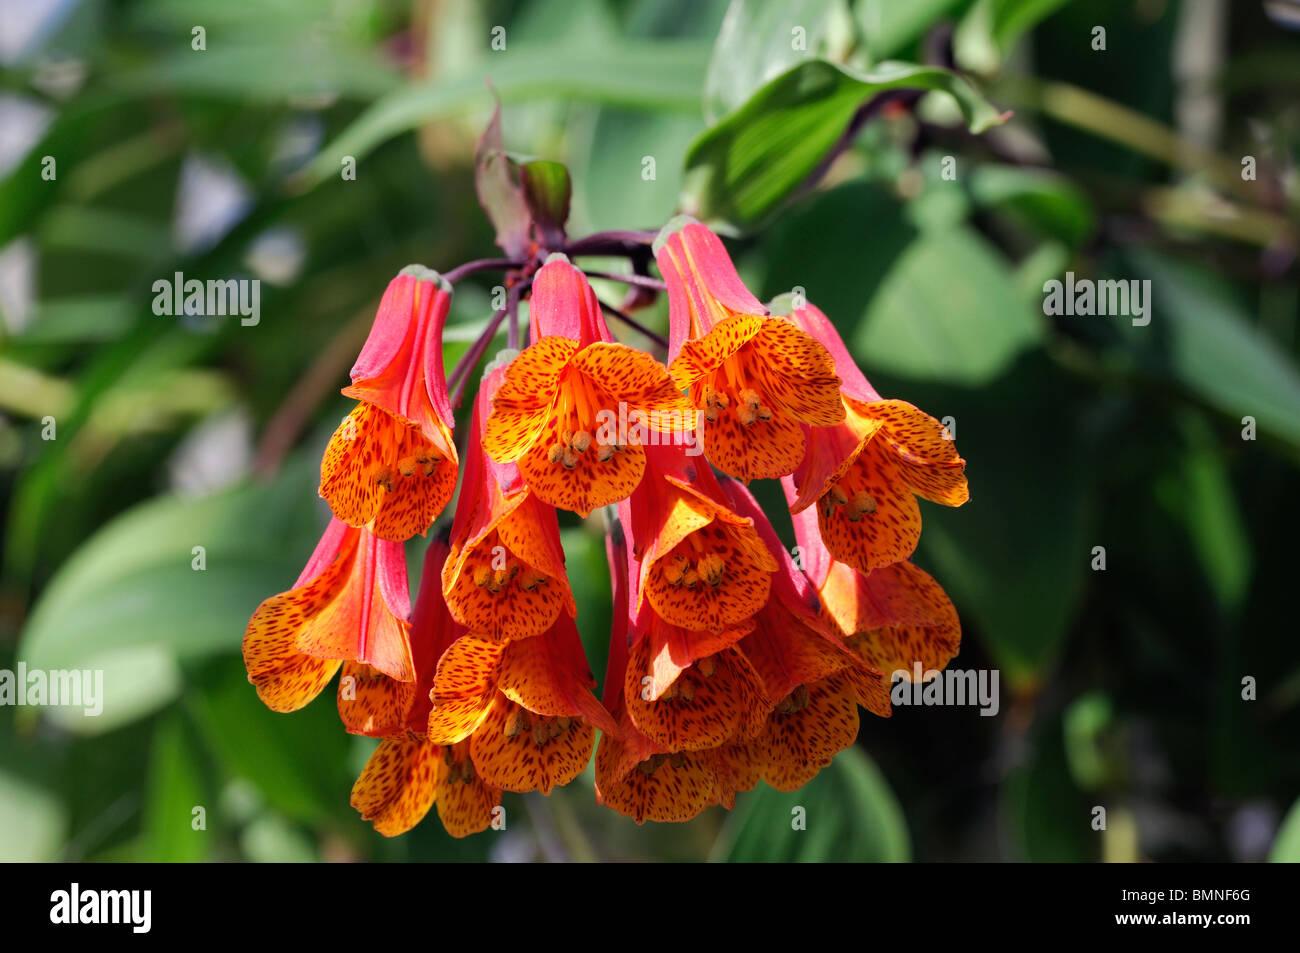 Macleania insignis unusual red orange flower plant bloom blossom Ericaceae - Stock Image